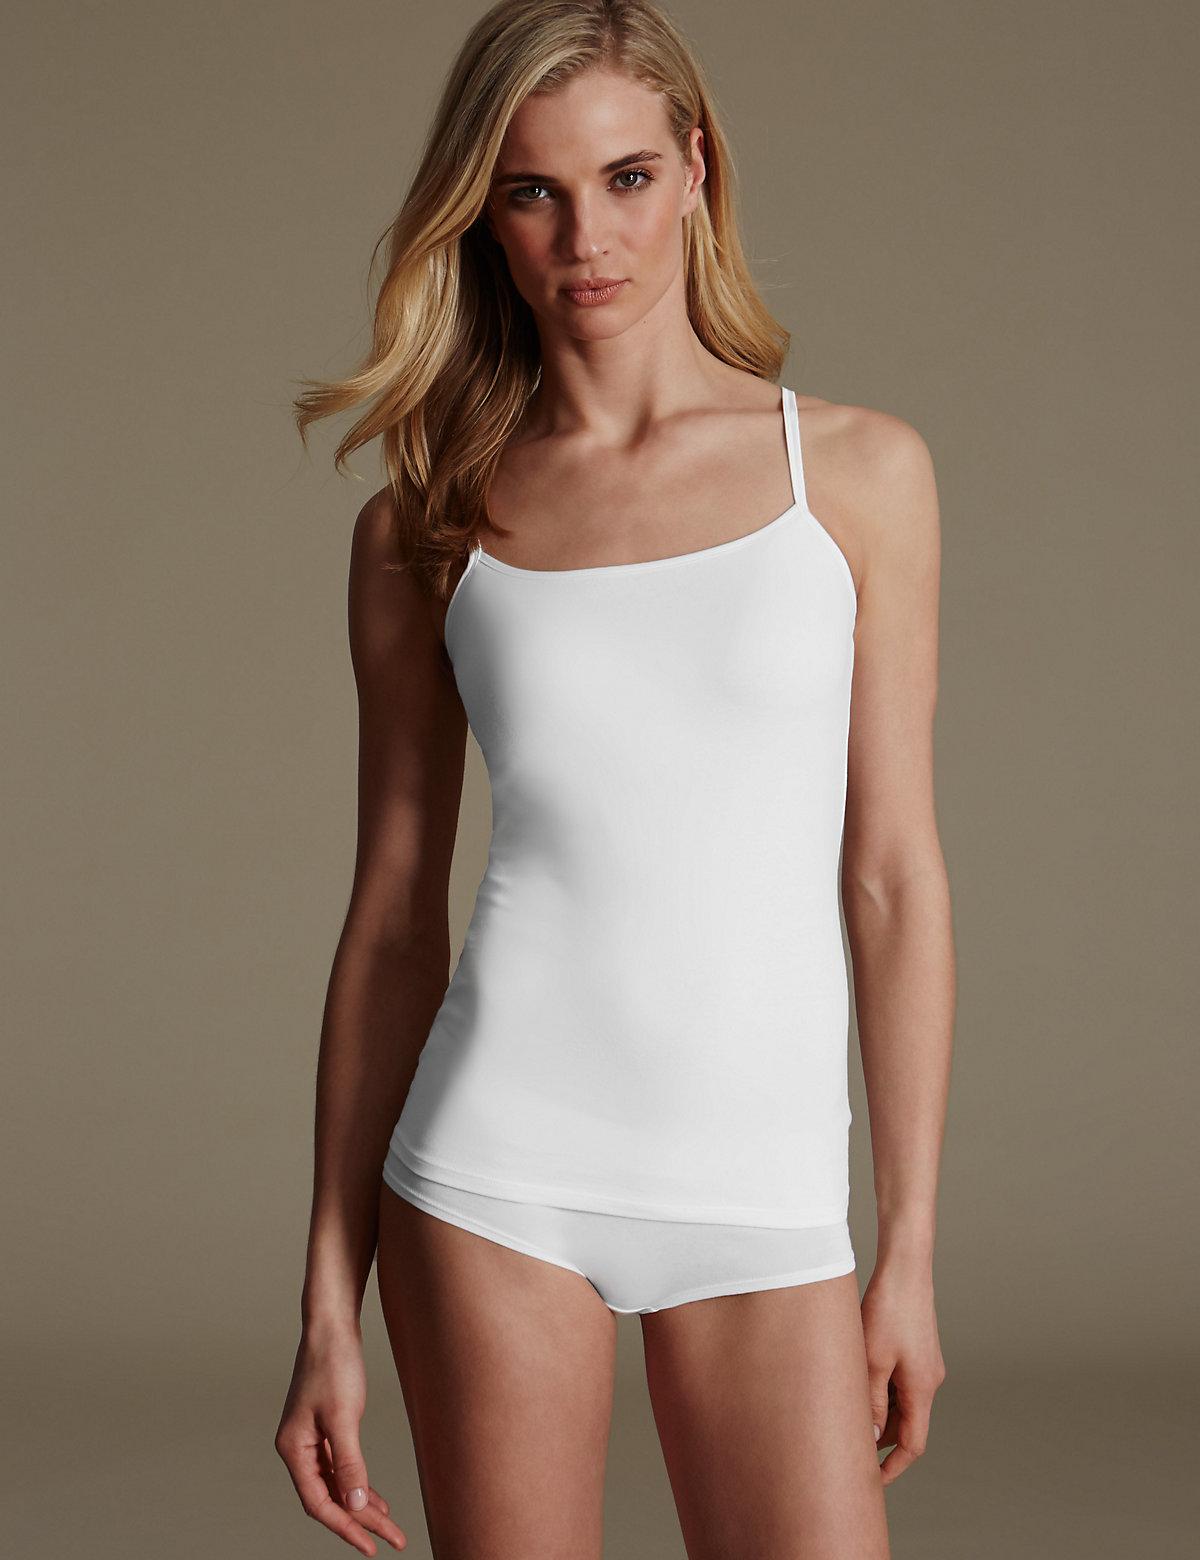 M&S Collection Secret Support Cotton Rich Strappy Bra Vest DD-G with Satin Trim